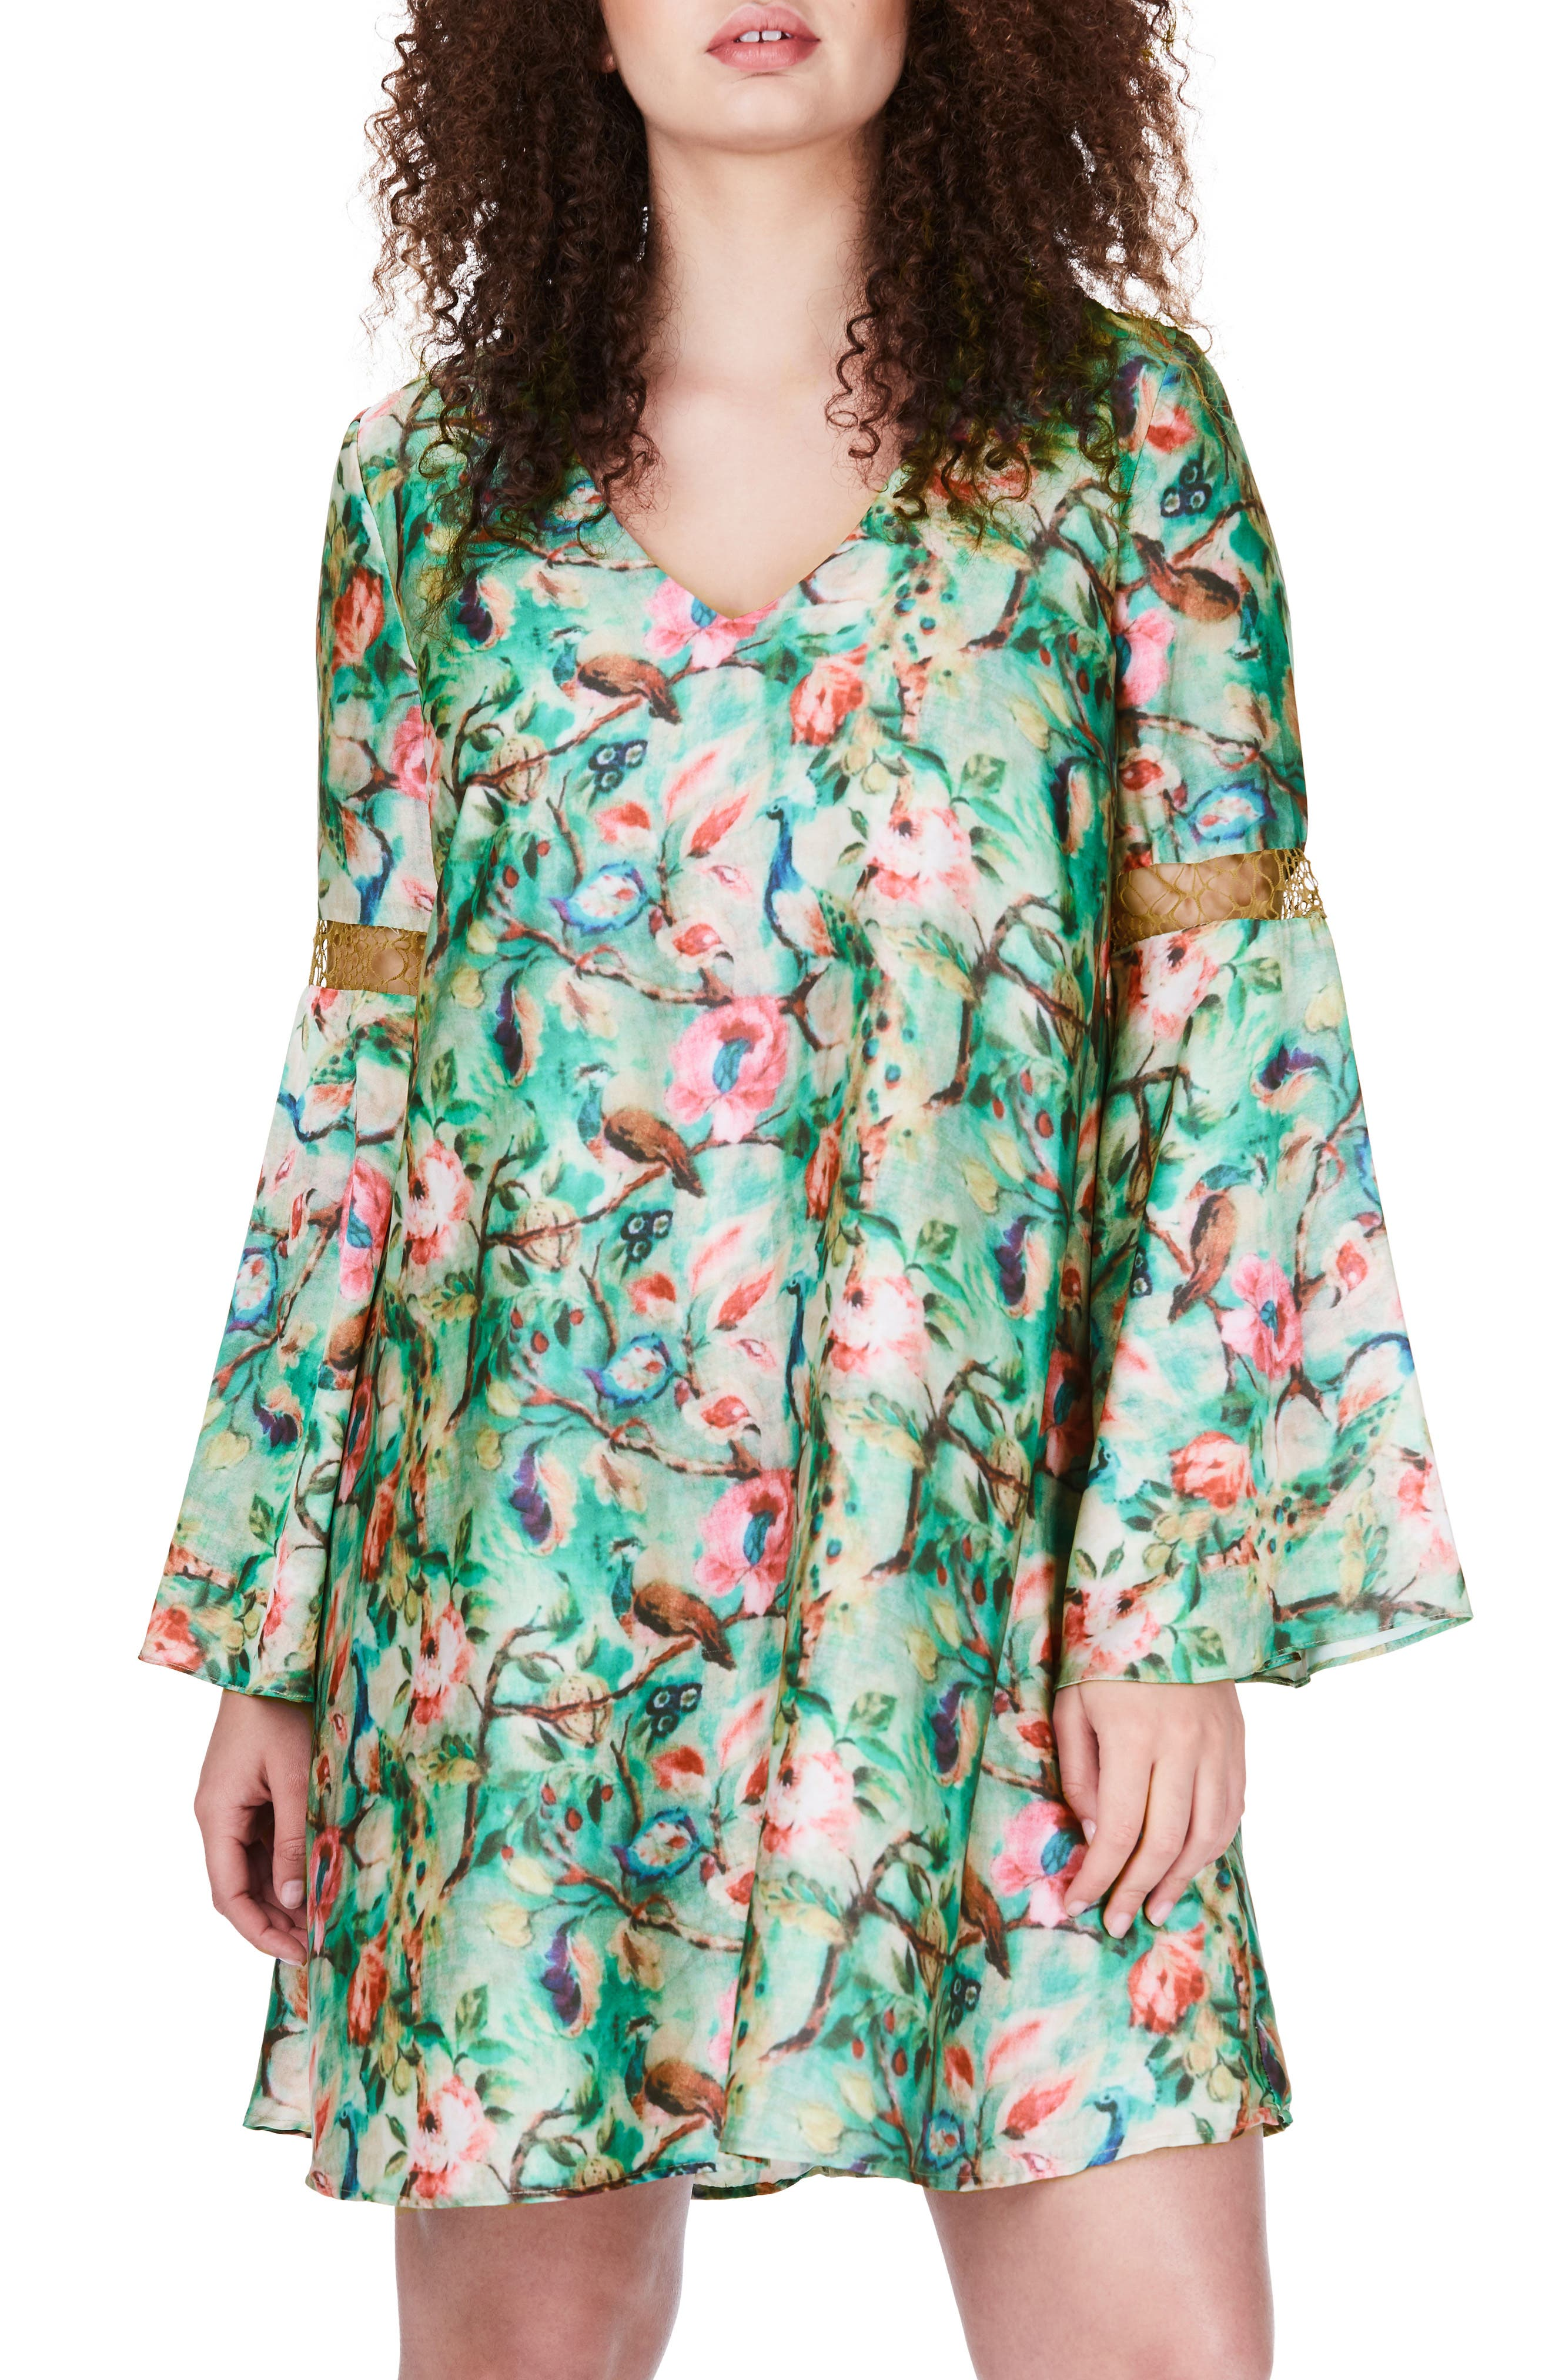 Bell Sleeve Floral Shift Dress,                             Main thumbnail 1, color,                             300